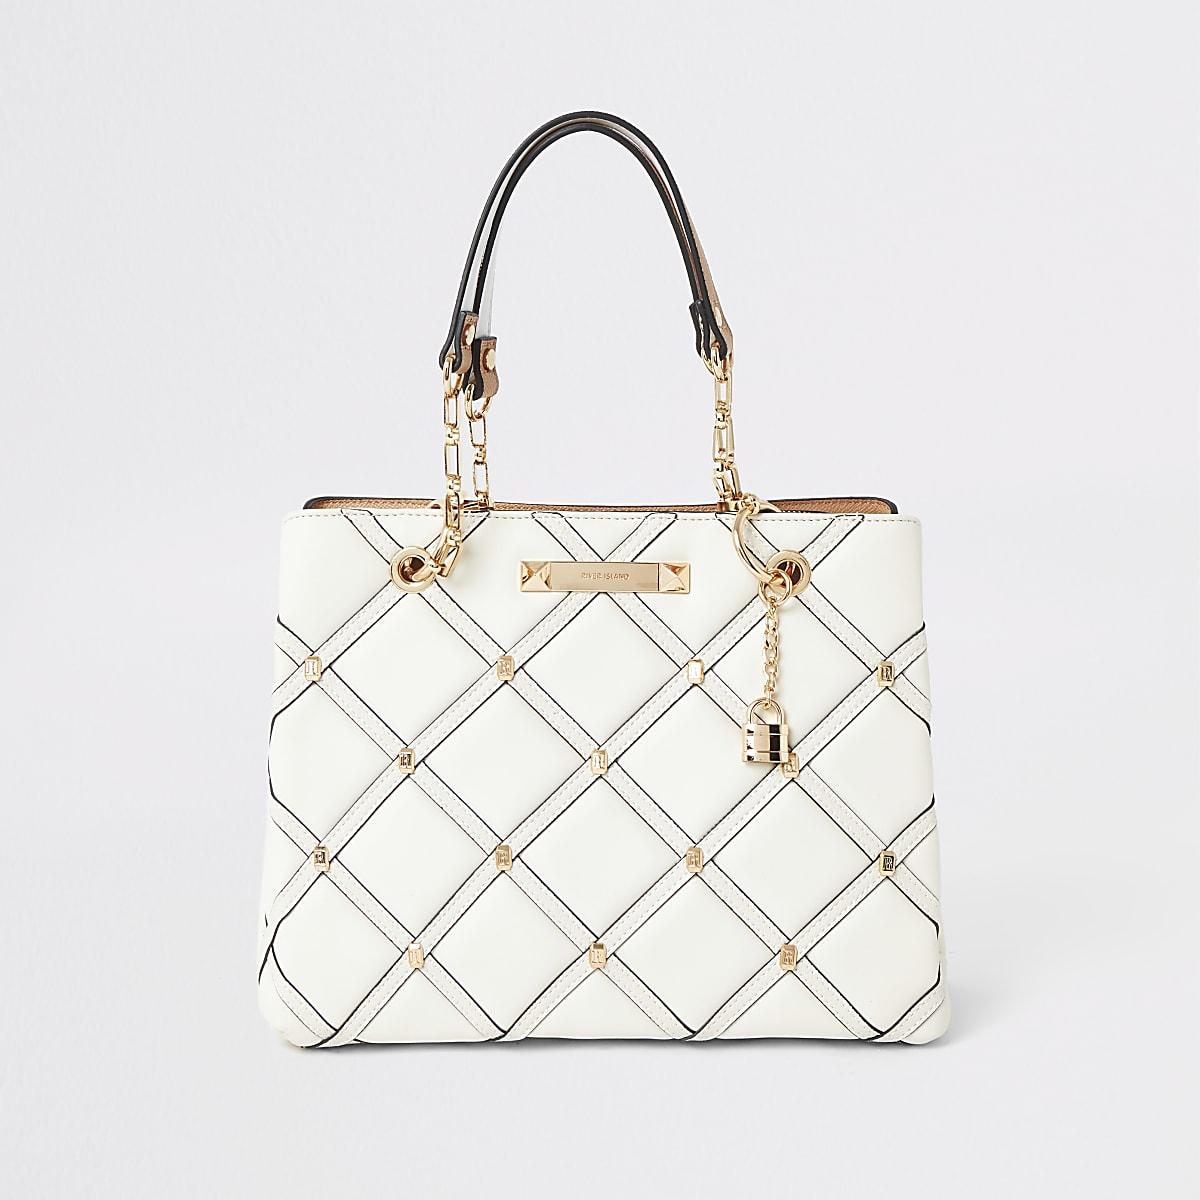 Crème gewatteerde handtas met studs